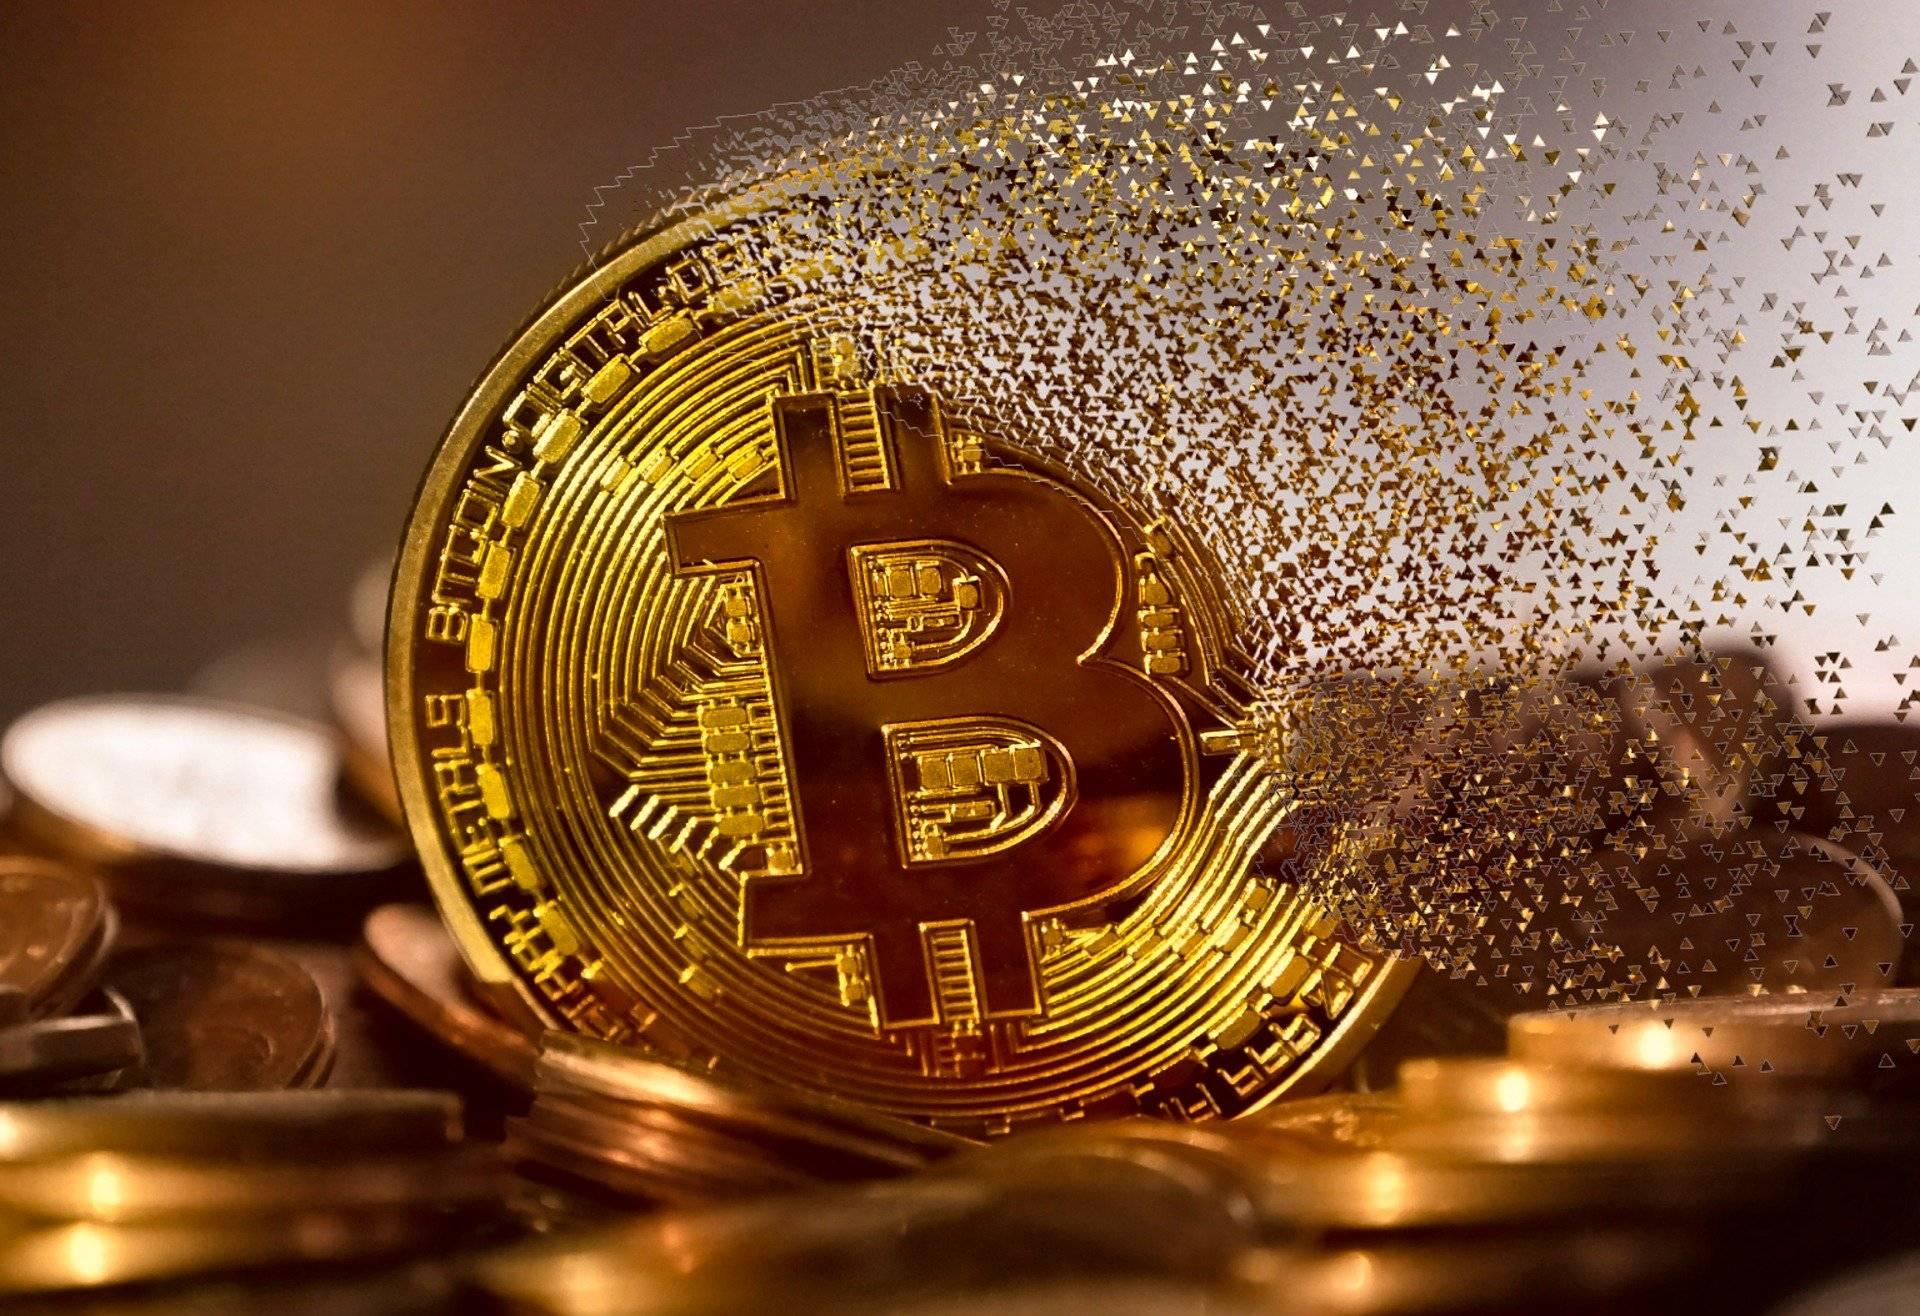 Bitcoin $BTC 21 millions